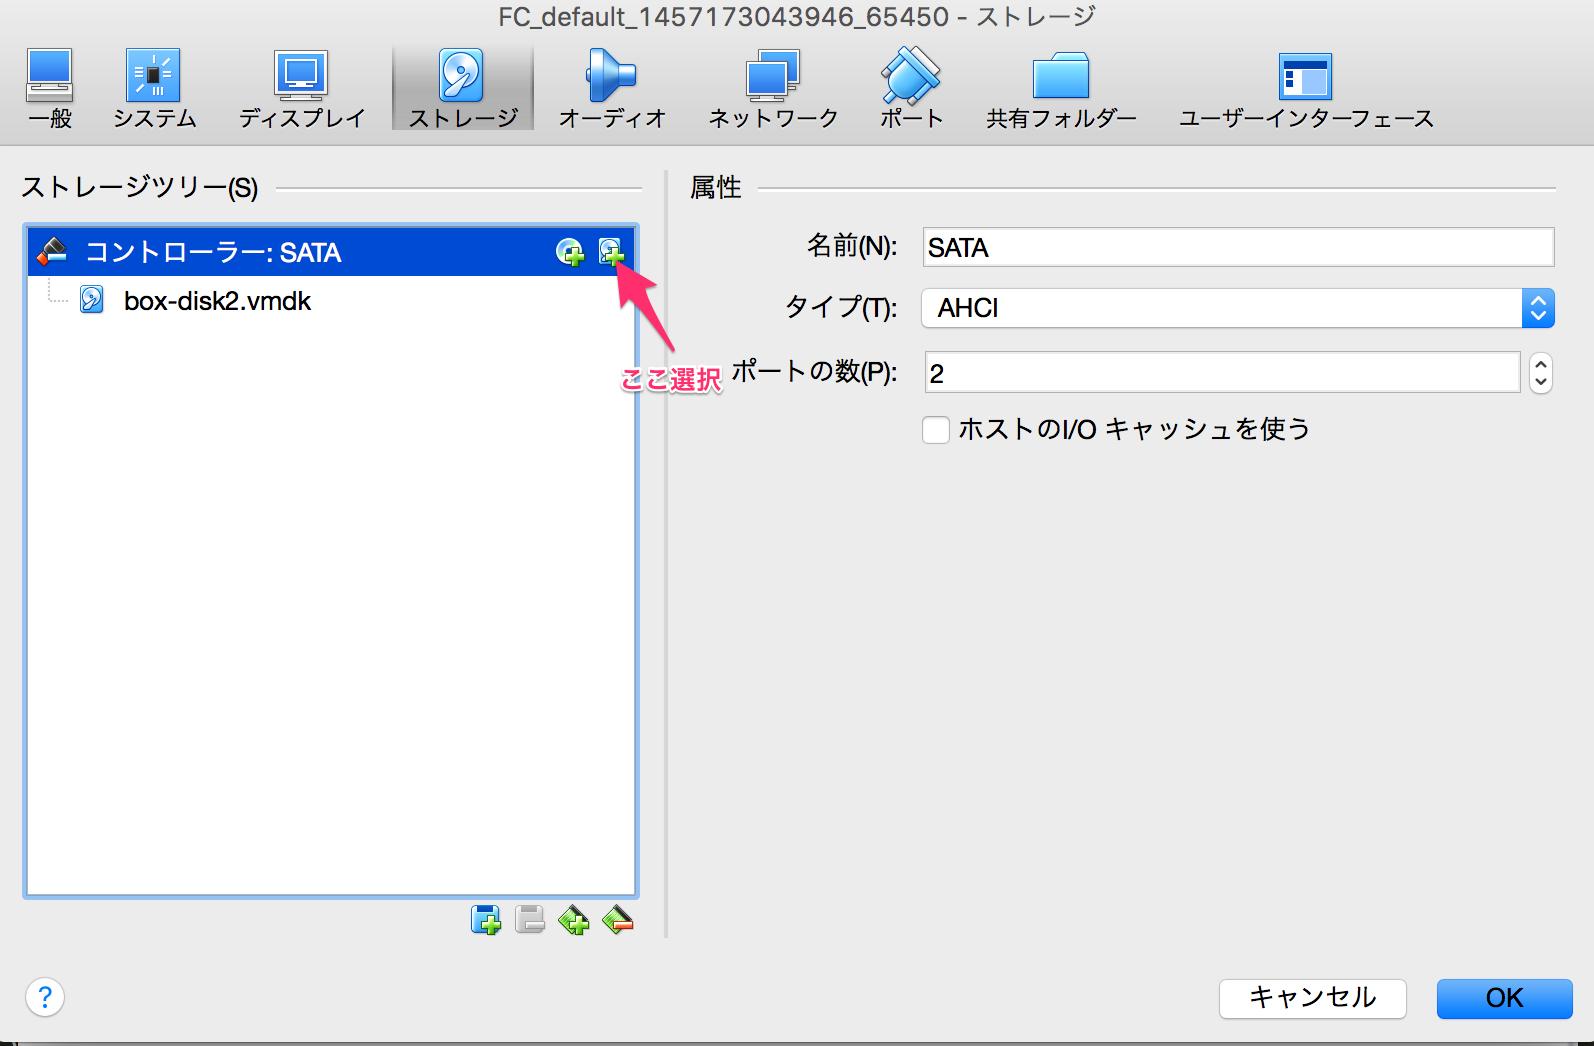 FC_default_1457173043946_65450_-_ストレージ_と_Oracle_VM_VirtualBox_マネージャー_と__Users_yamasakitomohiro_VirtualBox_VMs_FC_default_.png